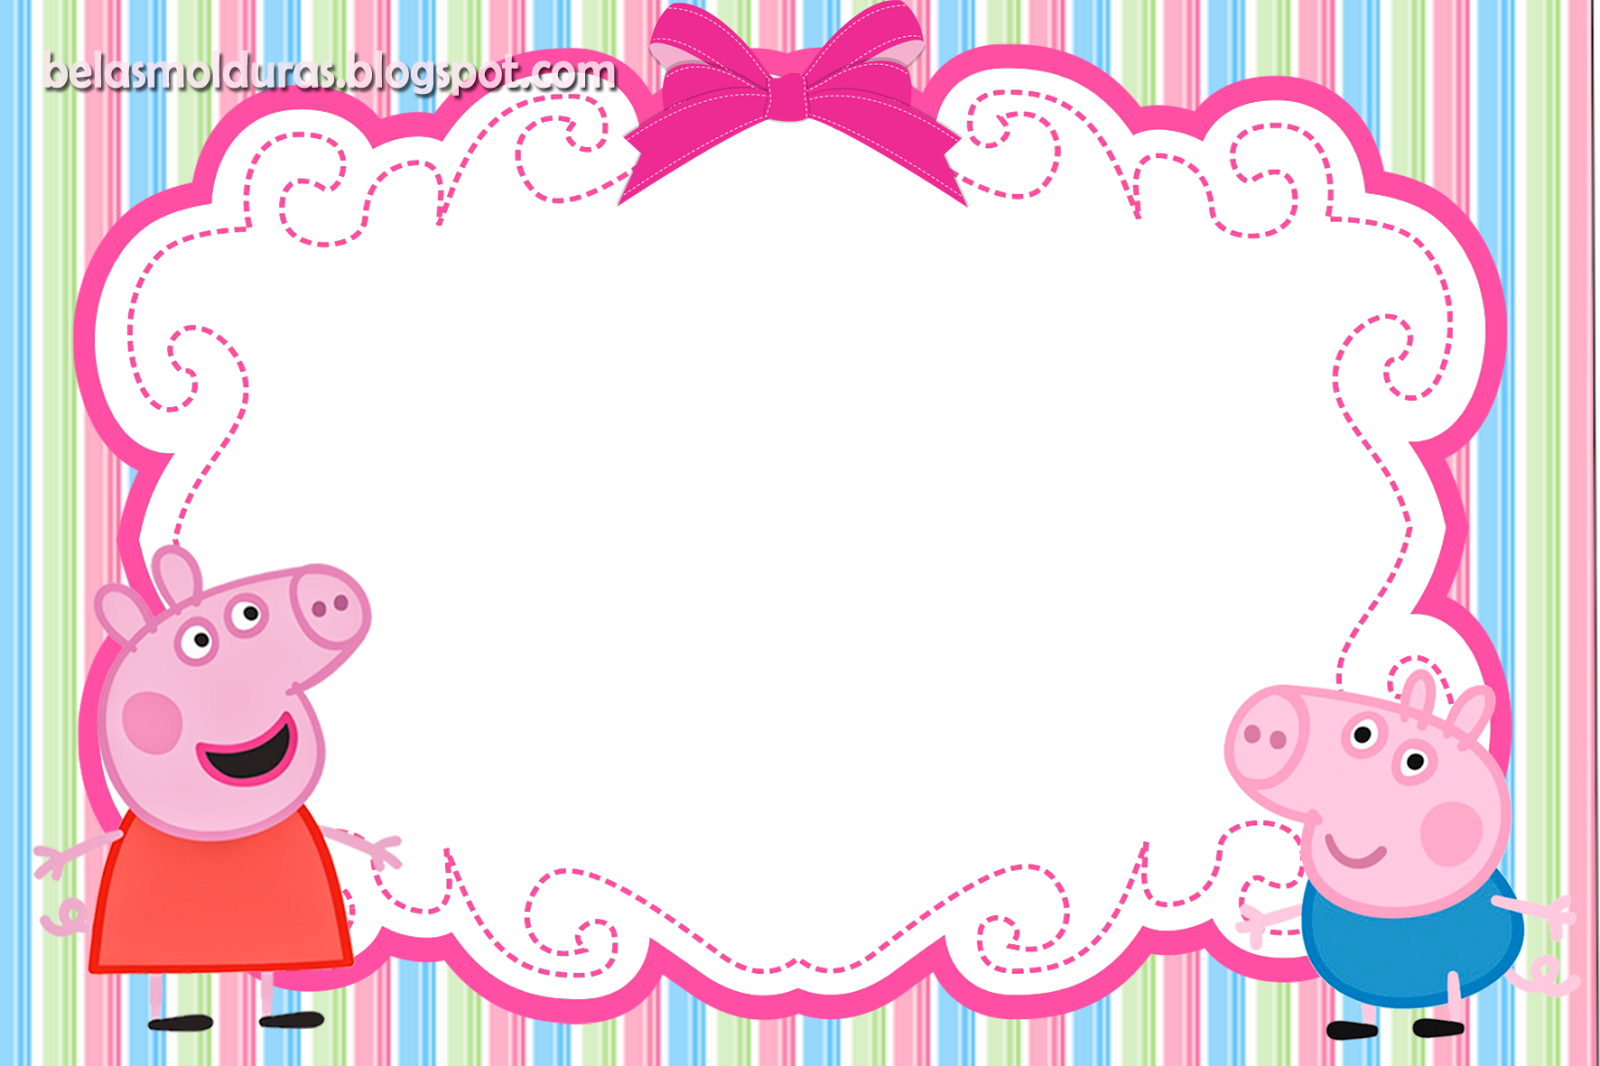 Convites De Aniversario Convites De Aniversario Peppa Pig